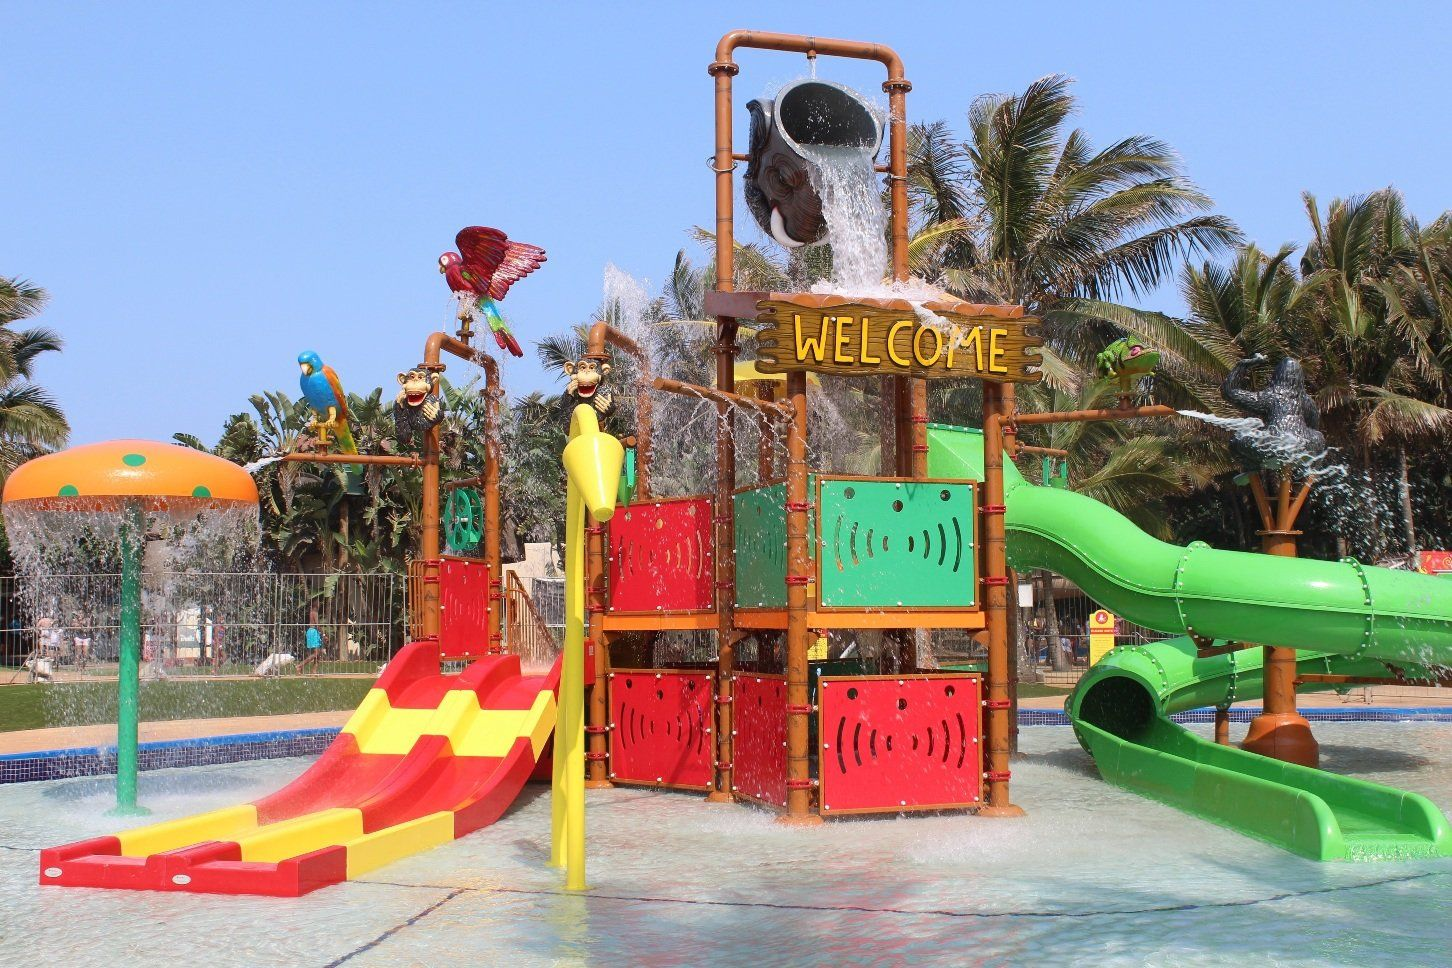 Image Result For Ushaka Wet N Wild Wet N Wild Fun Slide Fun